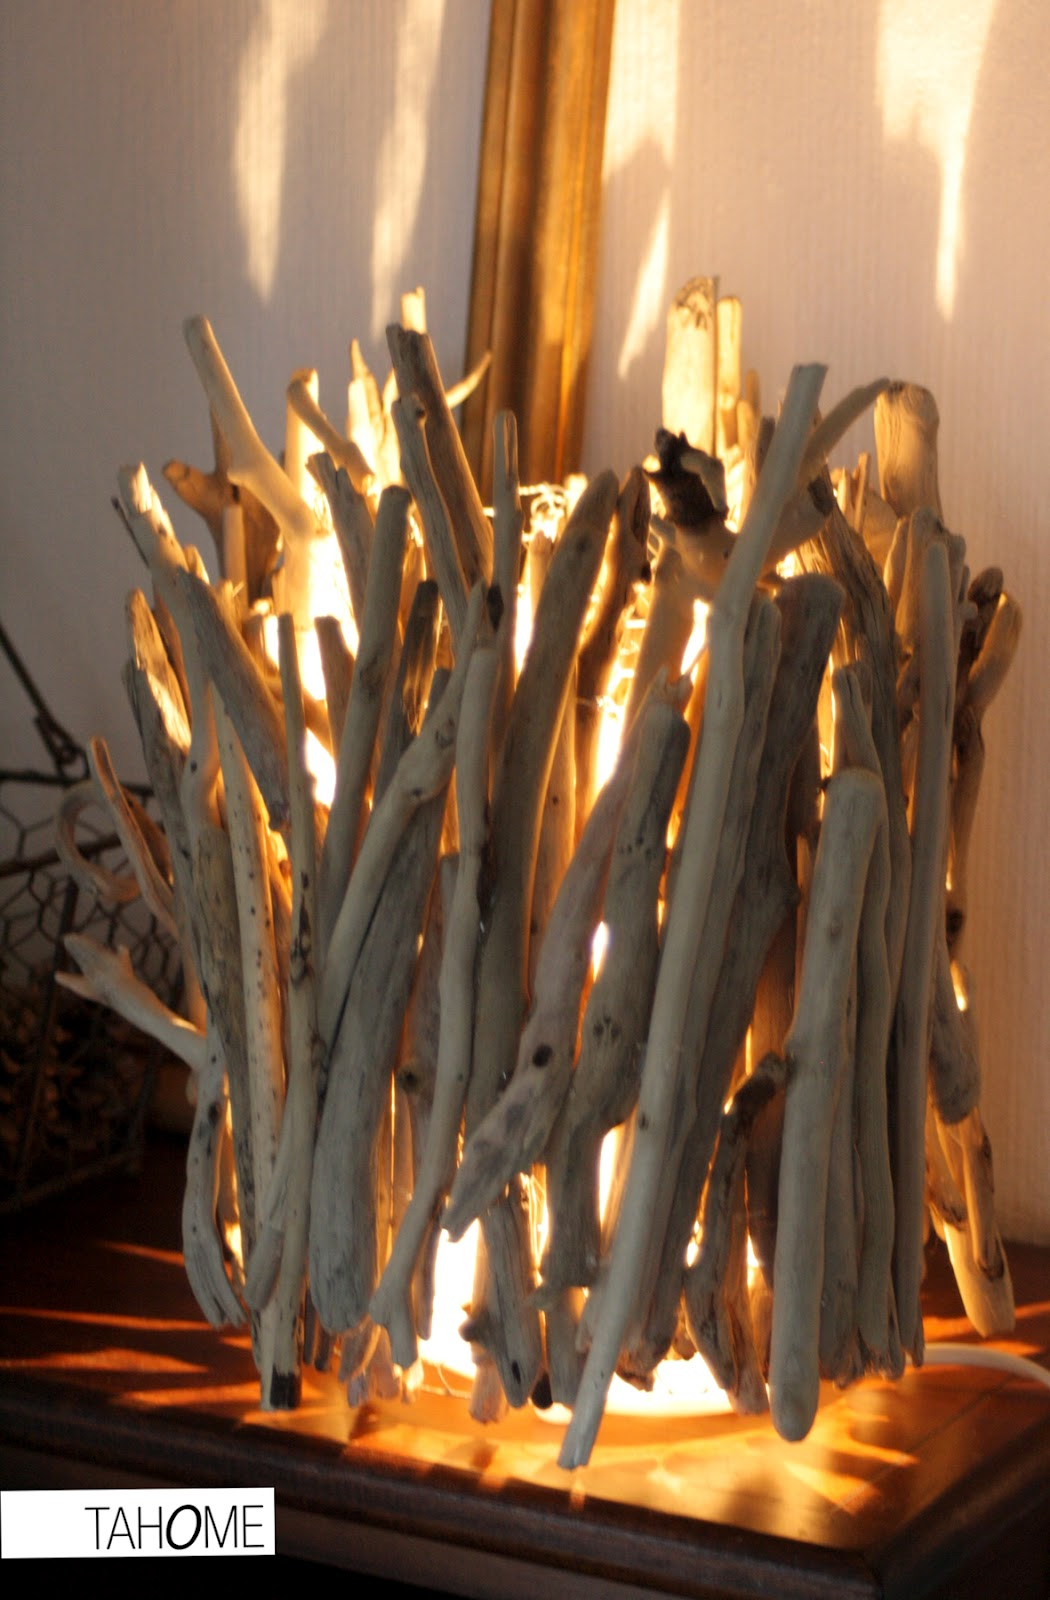 tahome luminaire. Black Bedroom Furniture Sets. Home Design Ideas